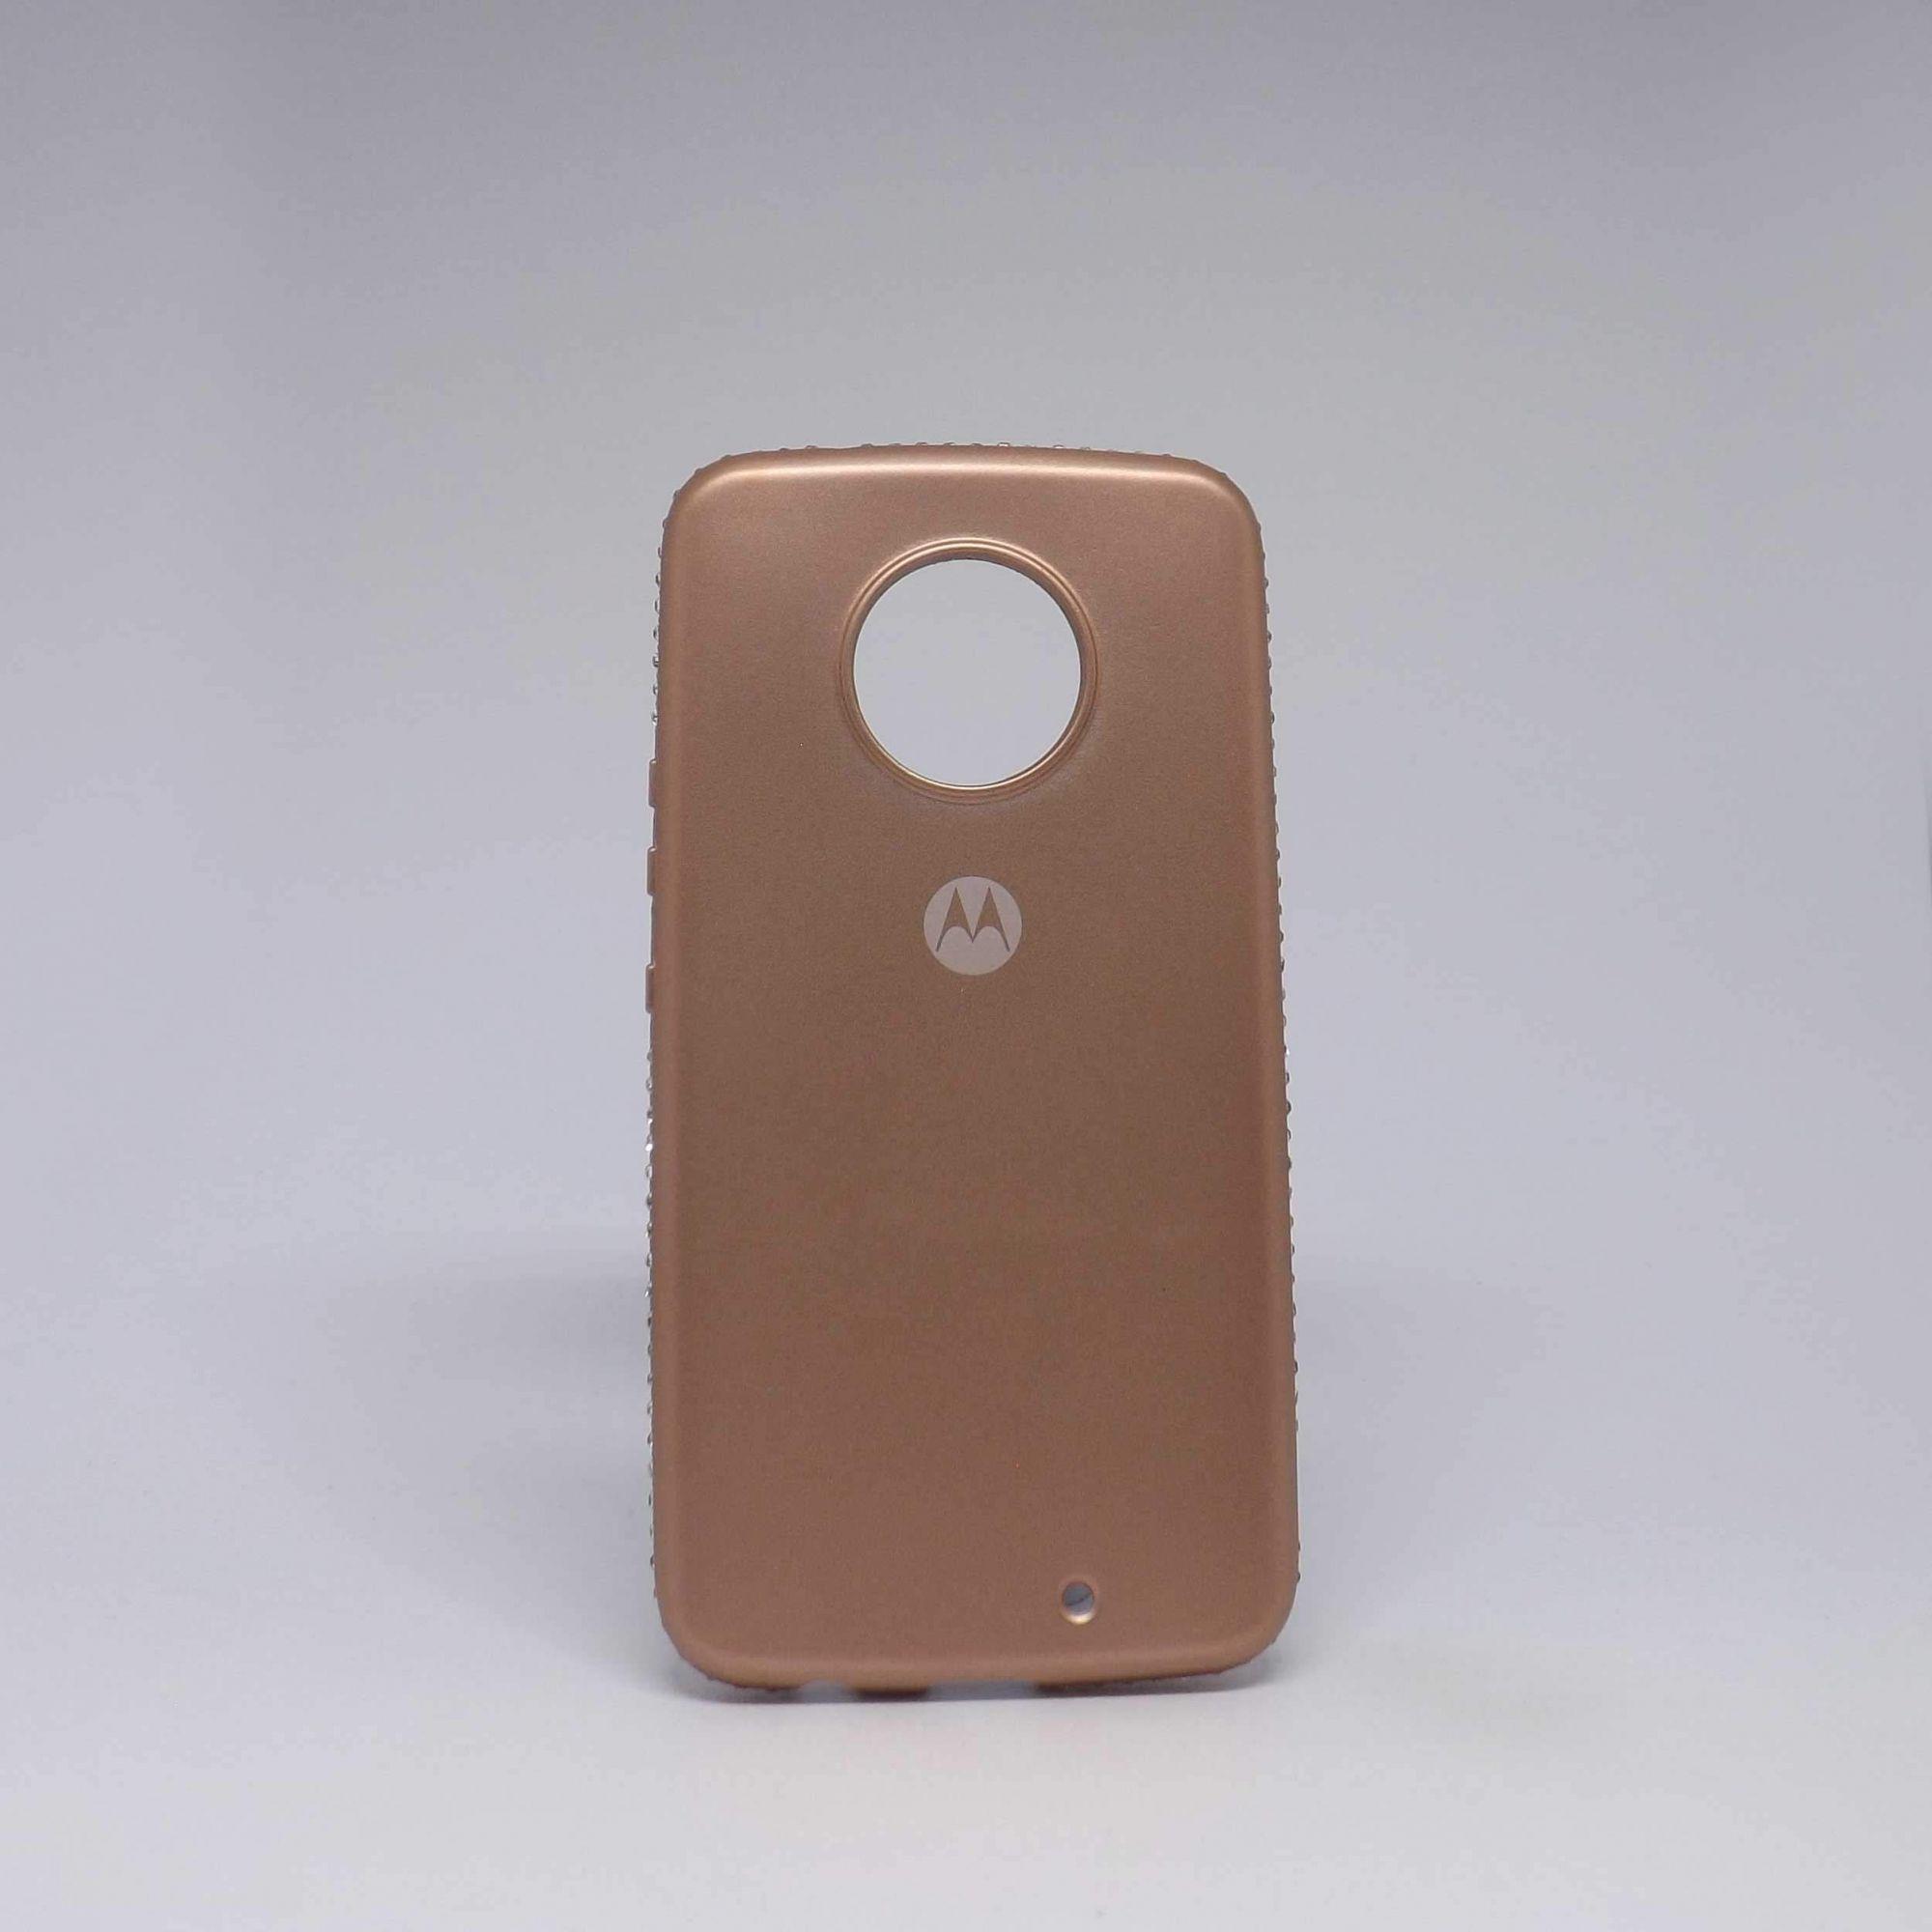 Capa Motorola X4 SGP Metalizada com Strass